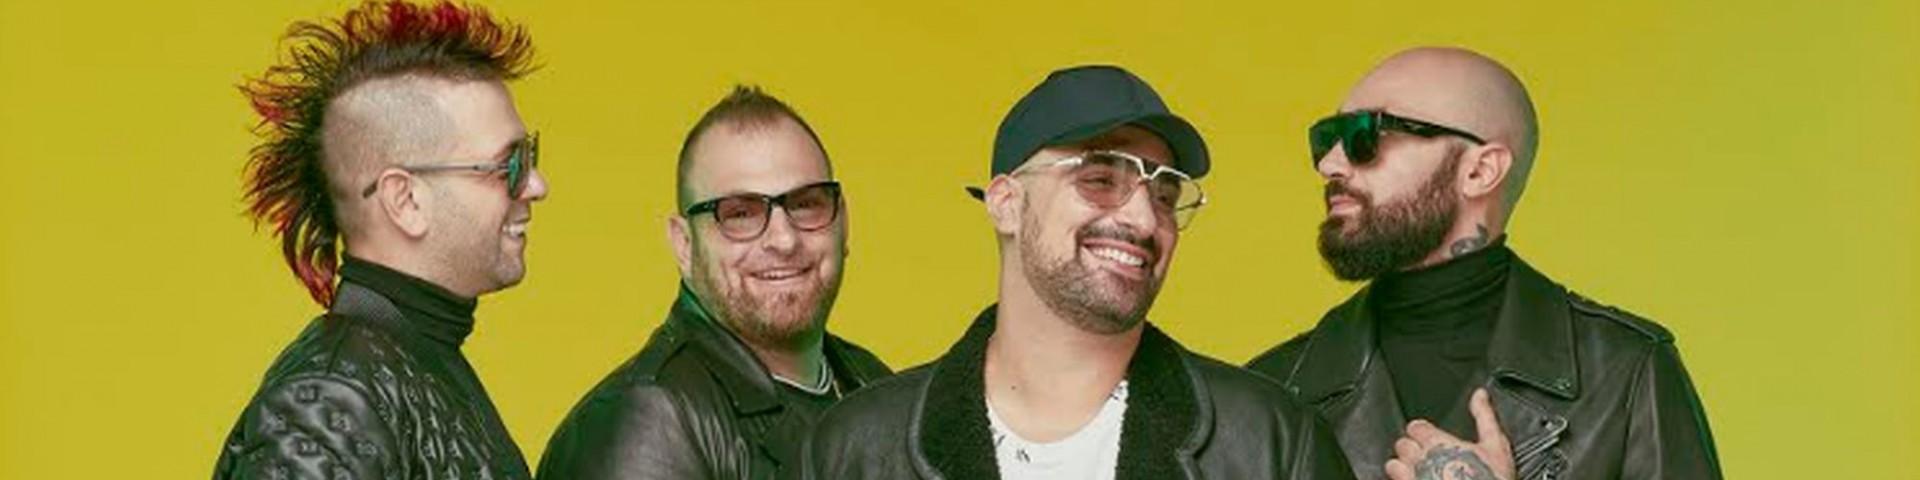 "I Boomdabash presentano ""Don't worry (Best Of 2005-2020)"": la conferenza stampa"